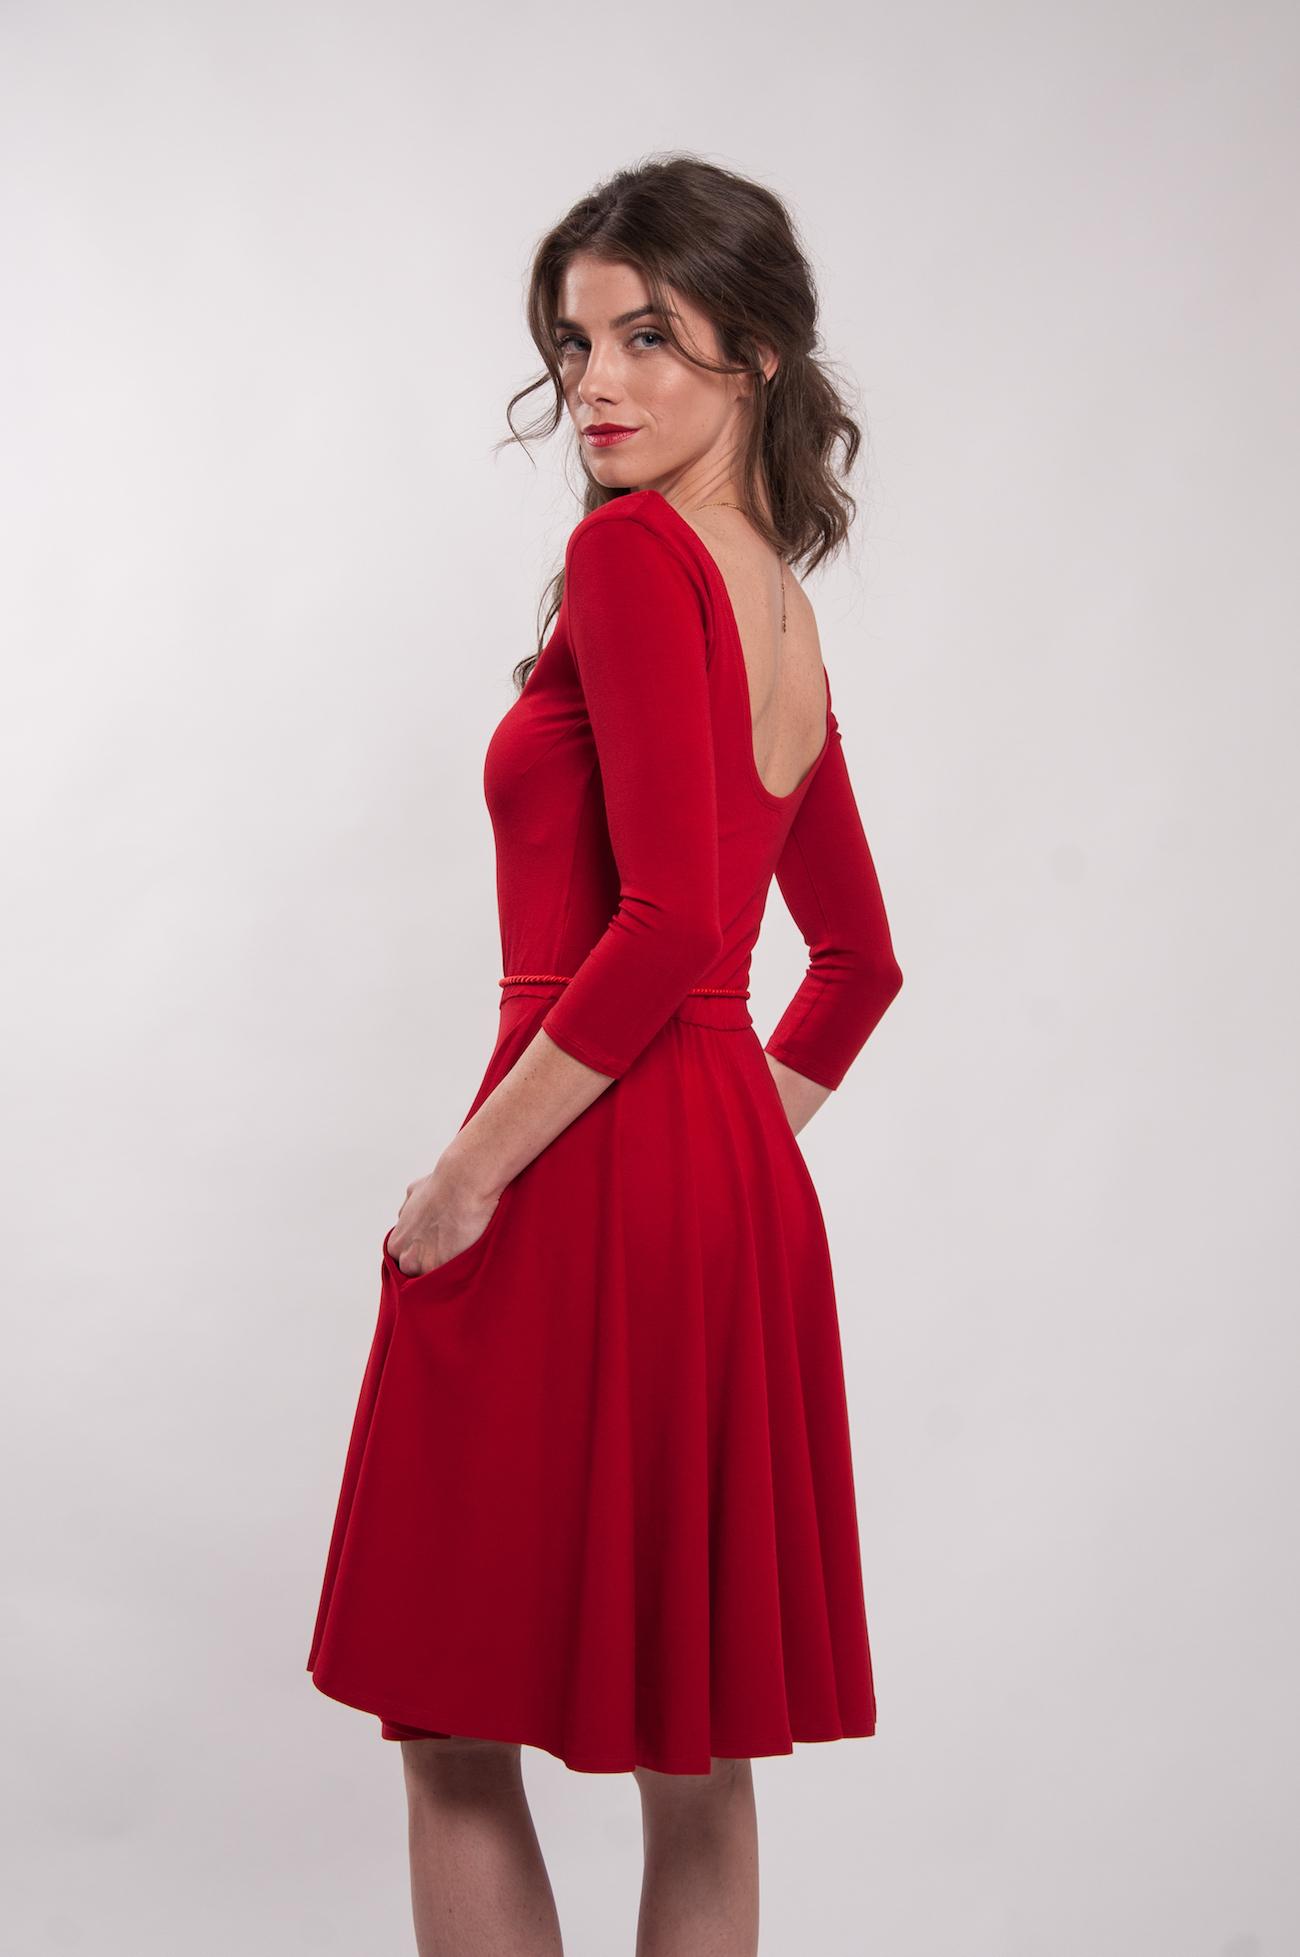 0789016f33a8 Červené šaty s 3 4 rukávy Karkulka